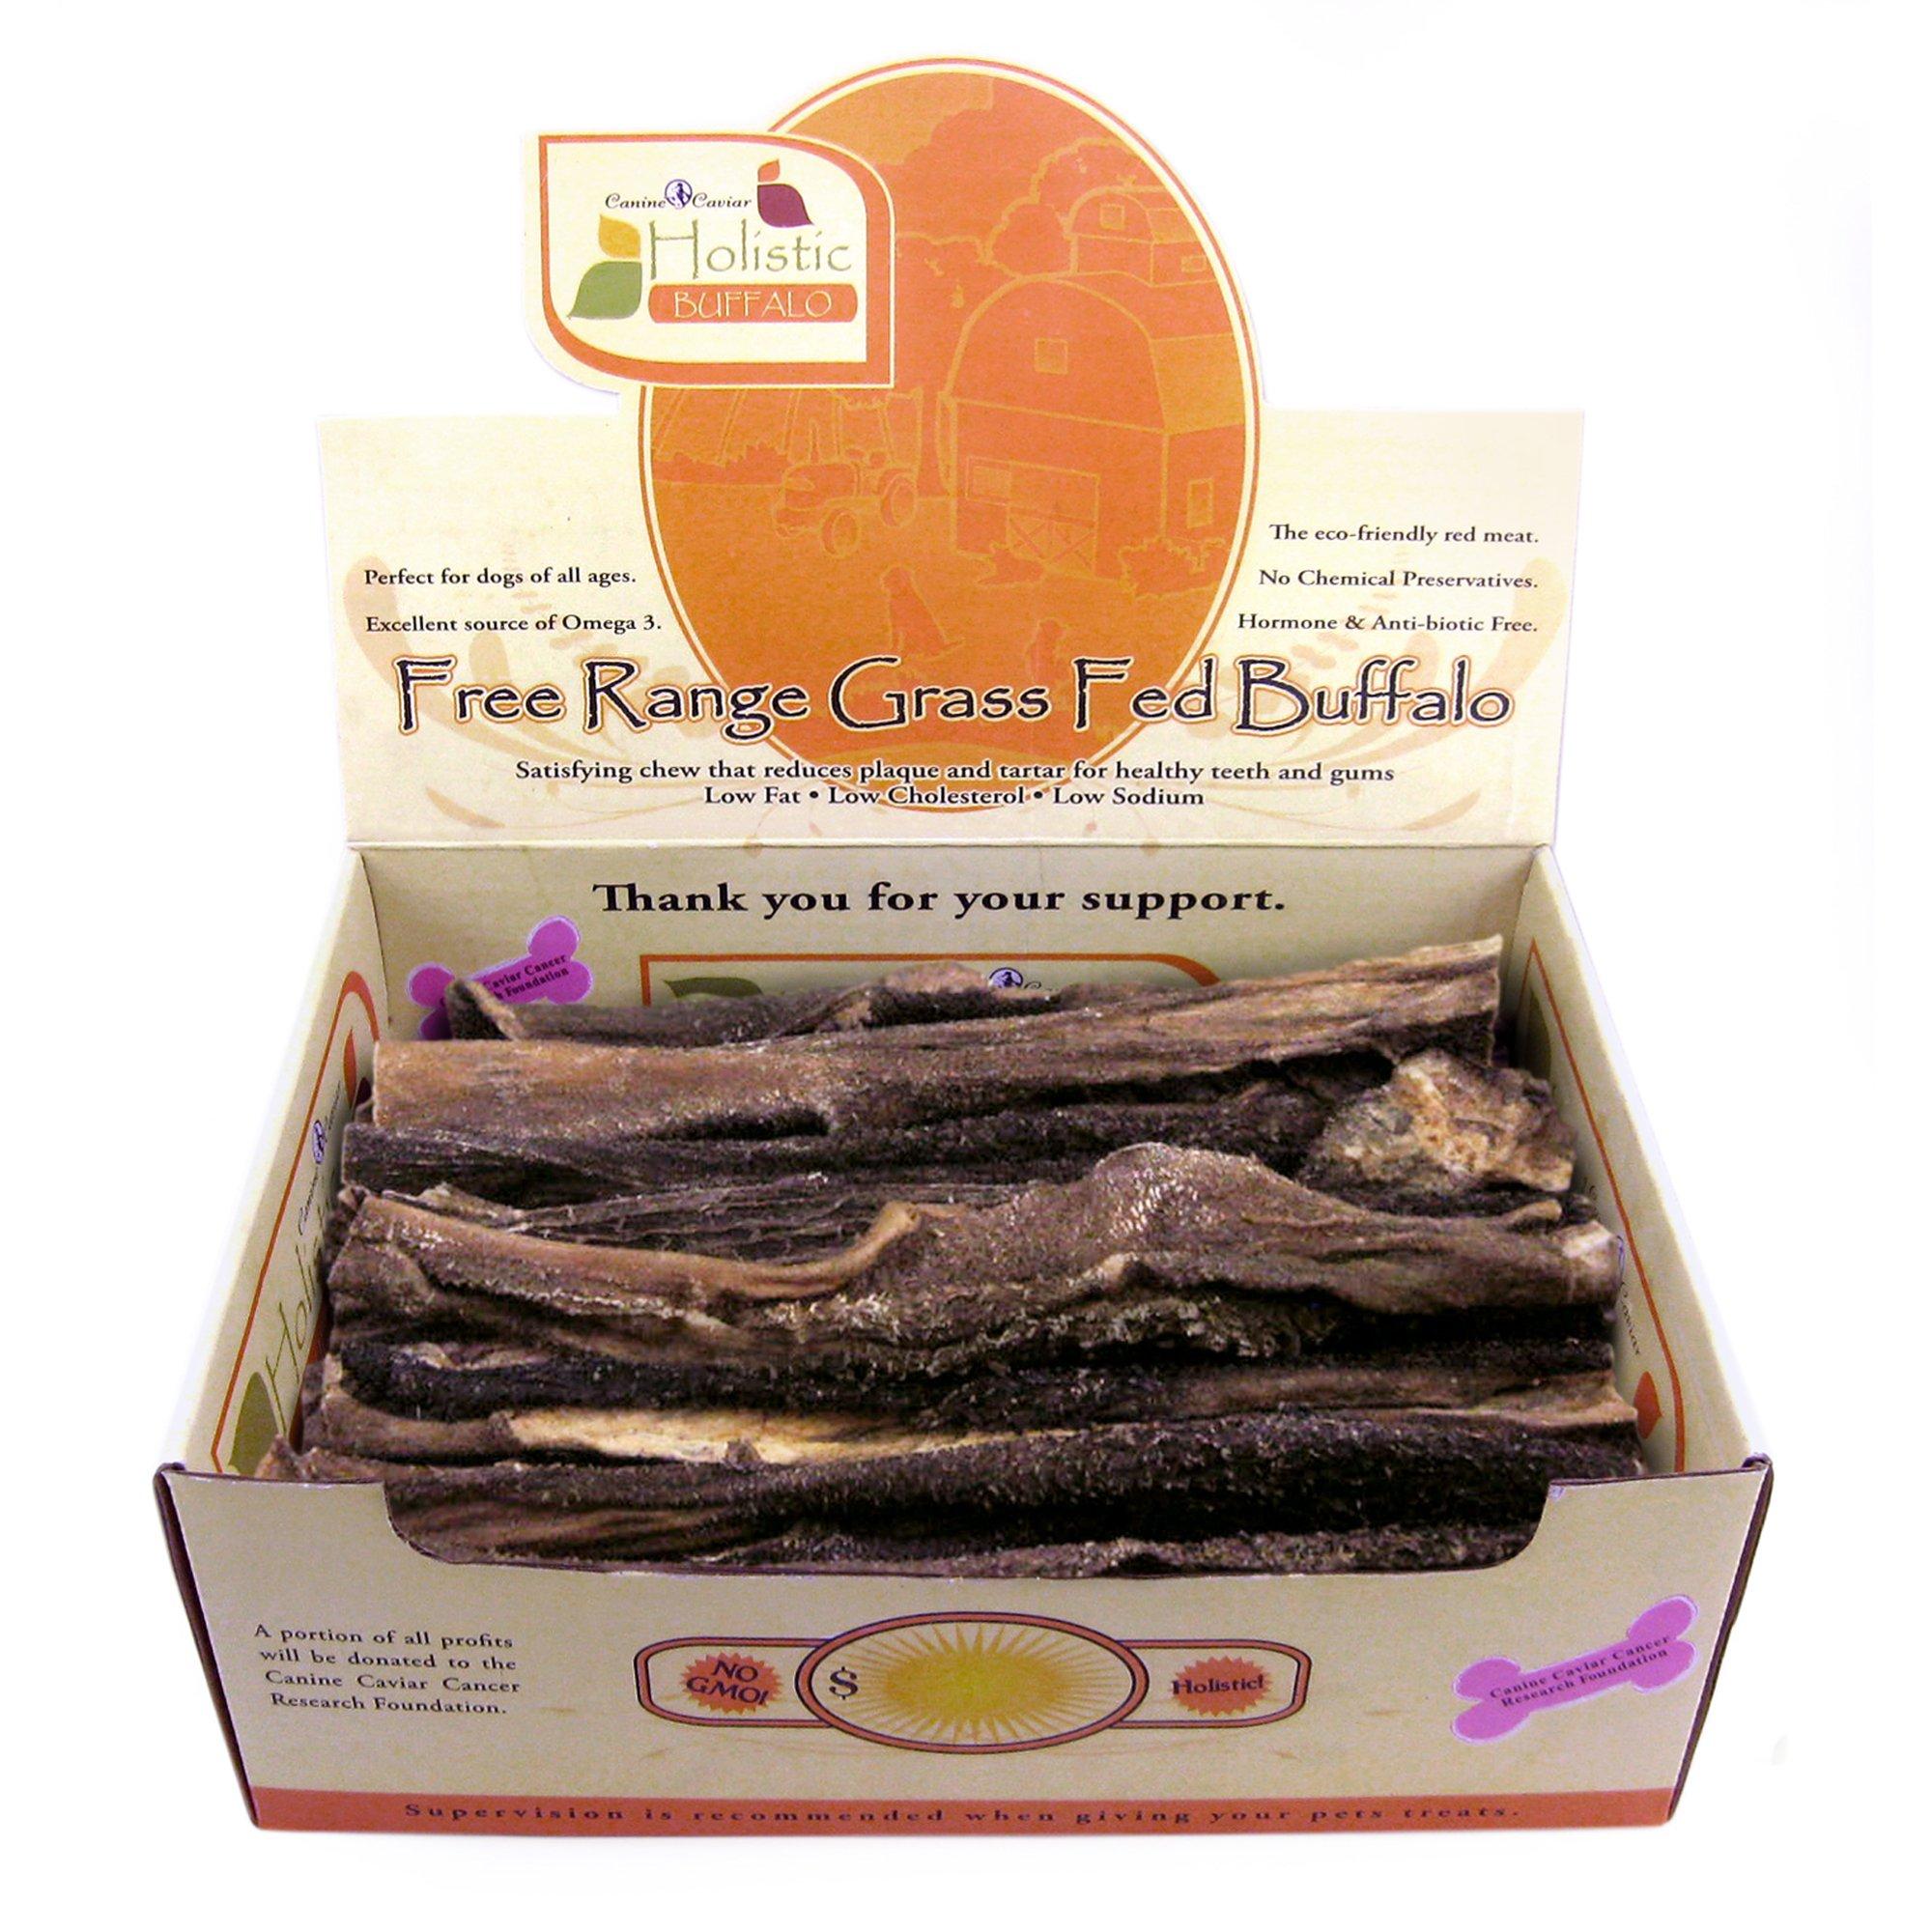 Canine Caviar 12-Inch Vanilla Buffalo Tripe Flat pet Food, 35 Count